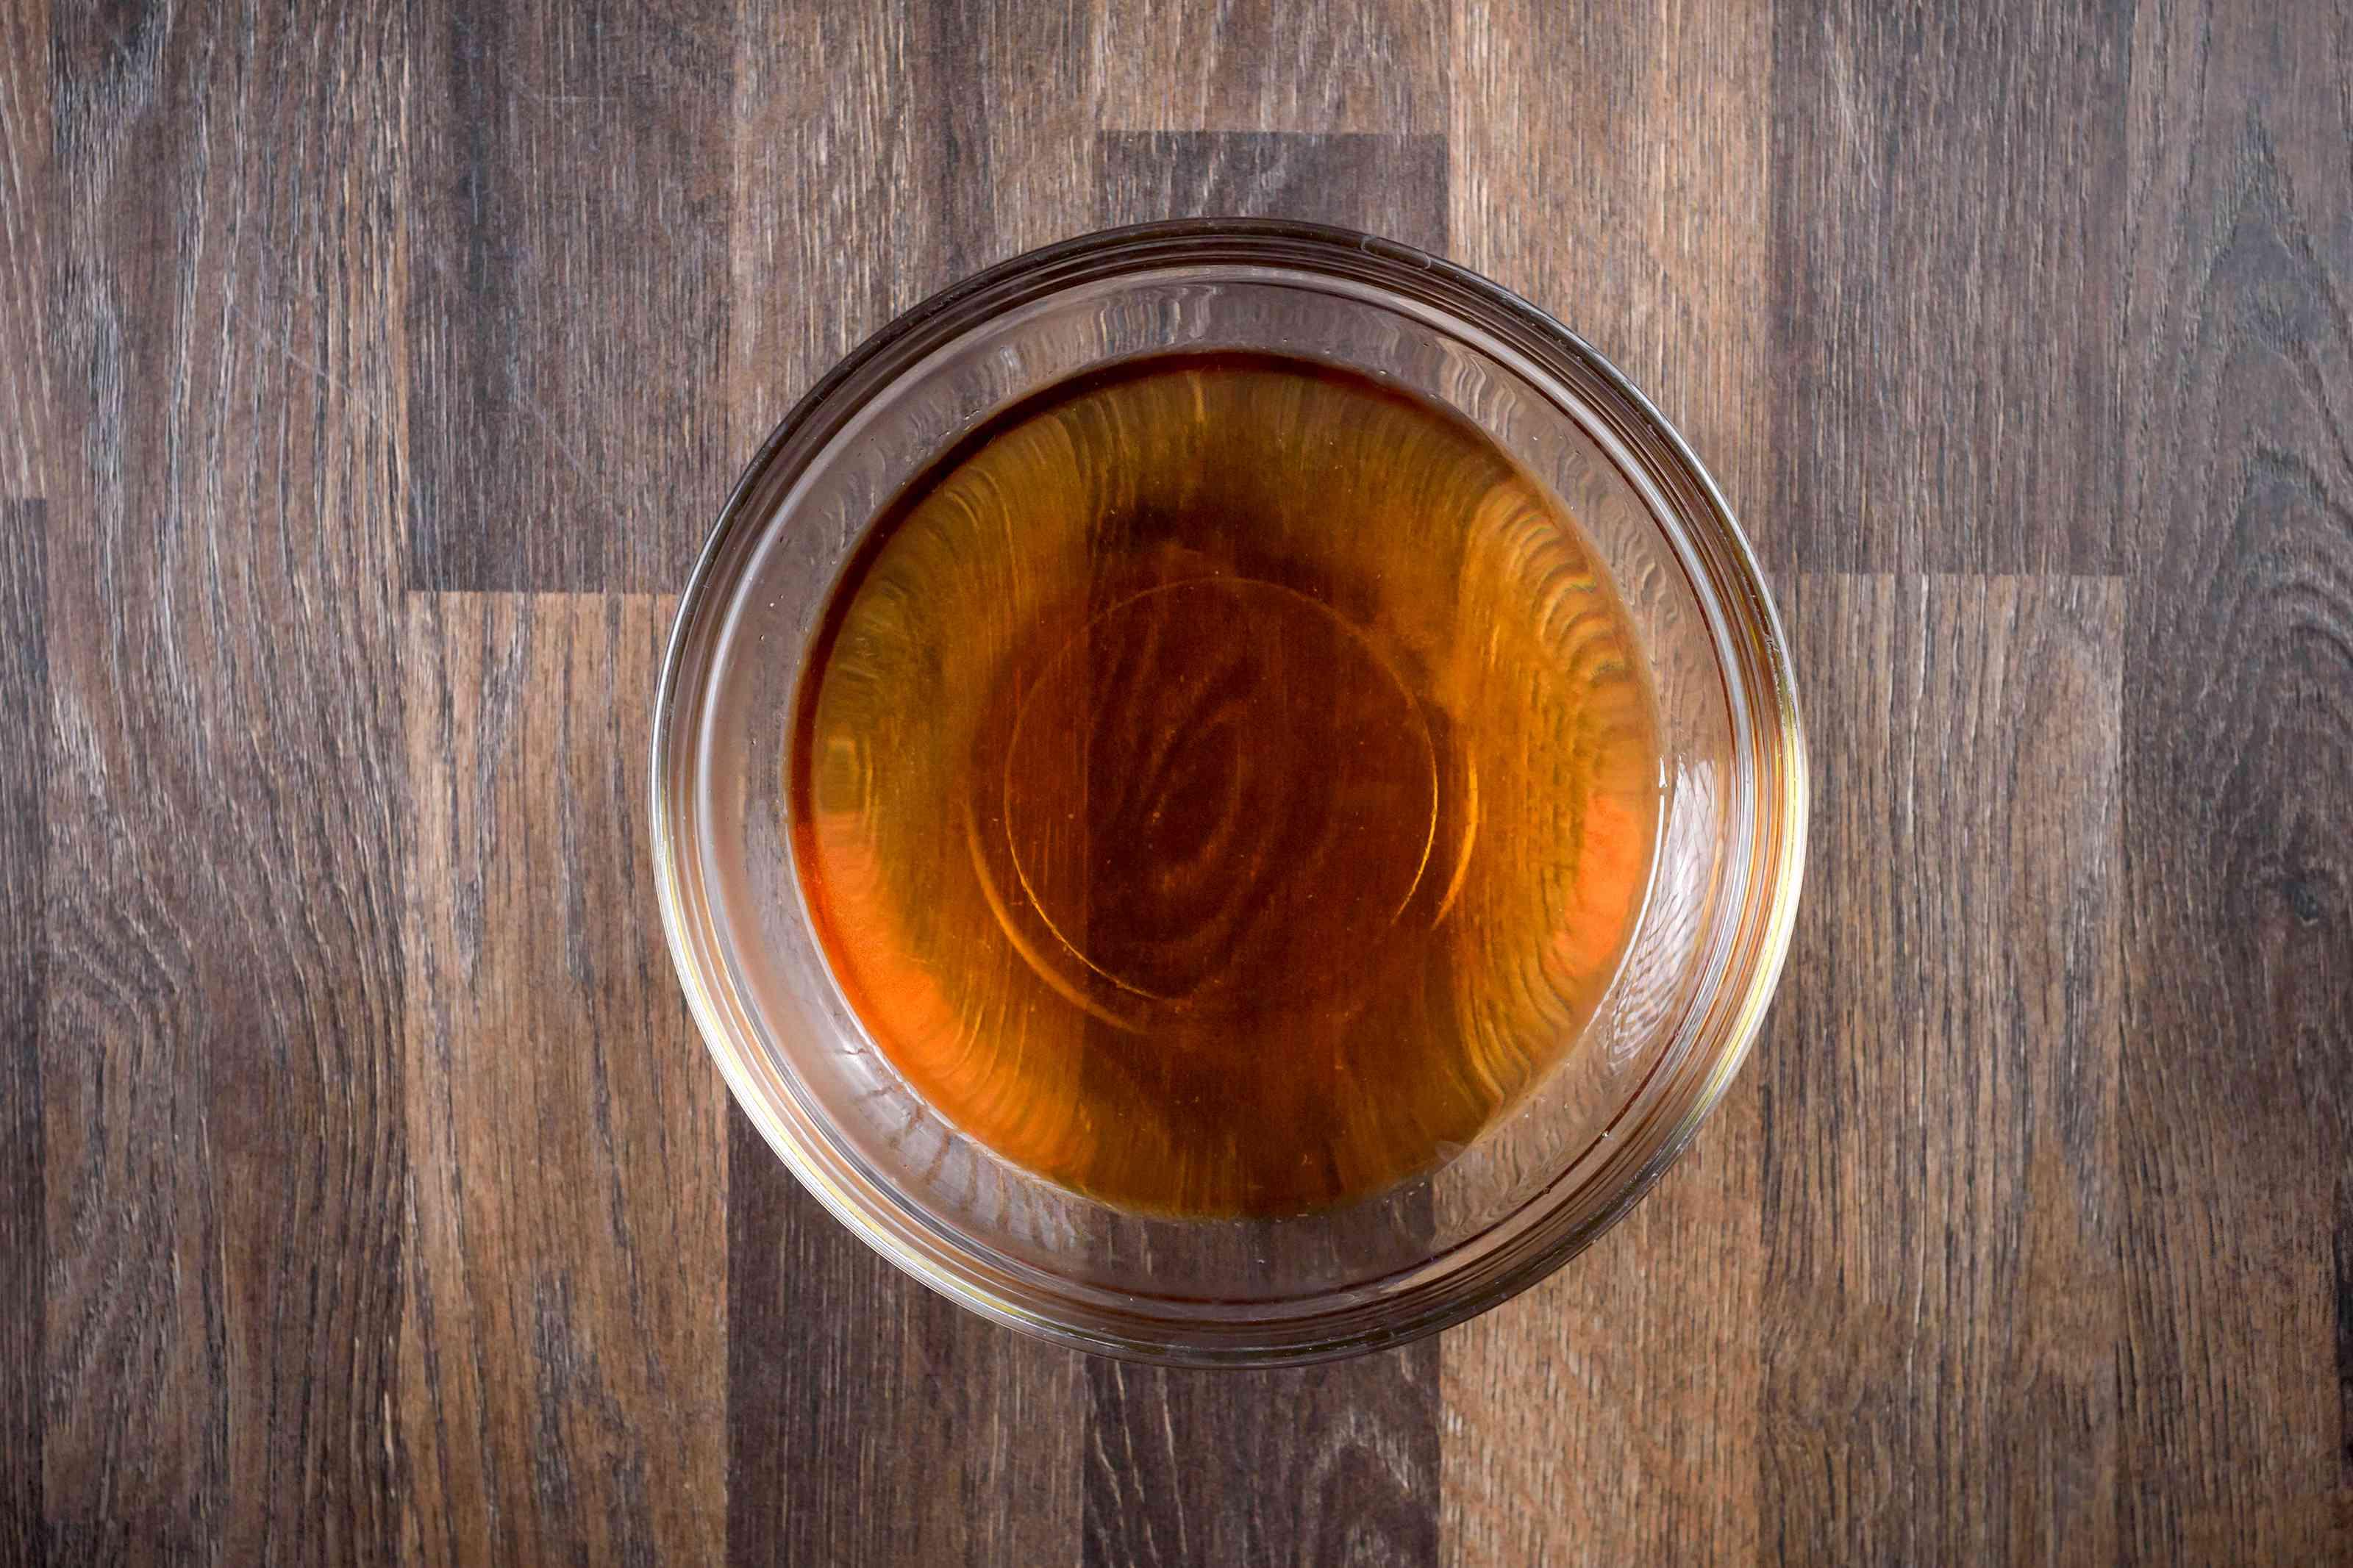 Microwave sugar and corn syrup